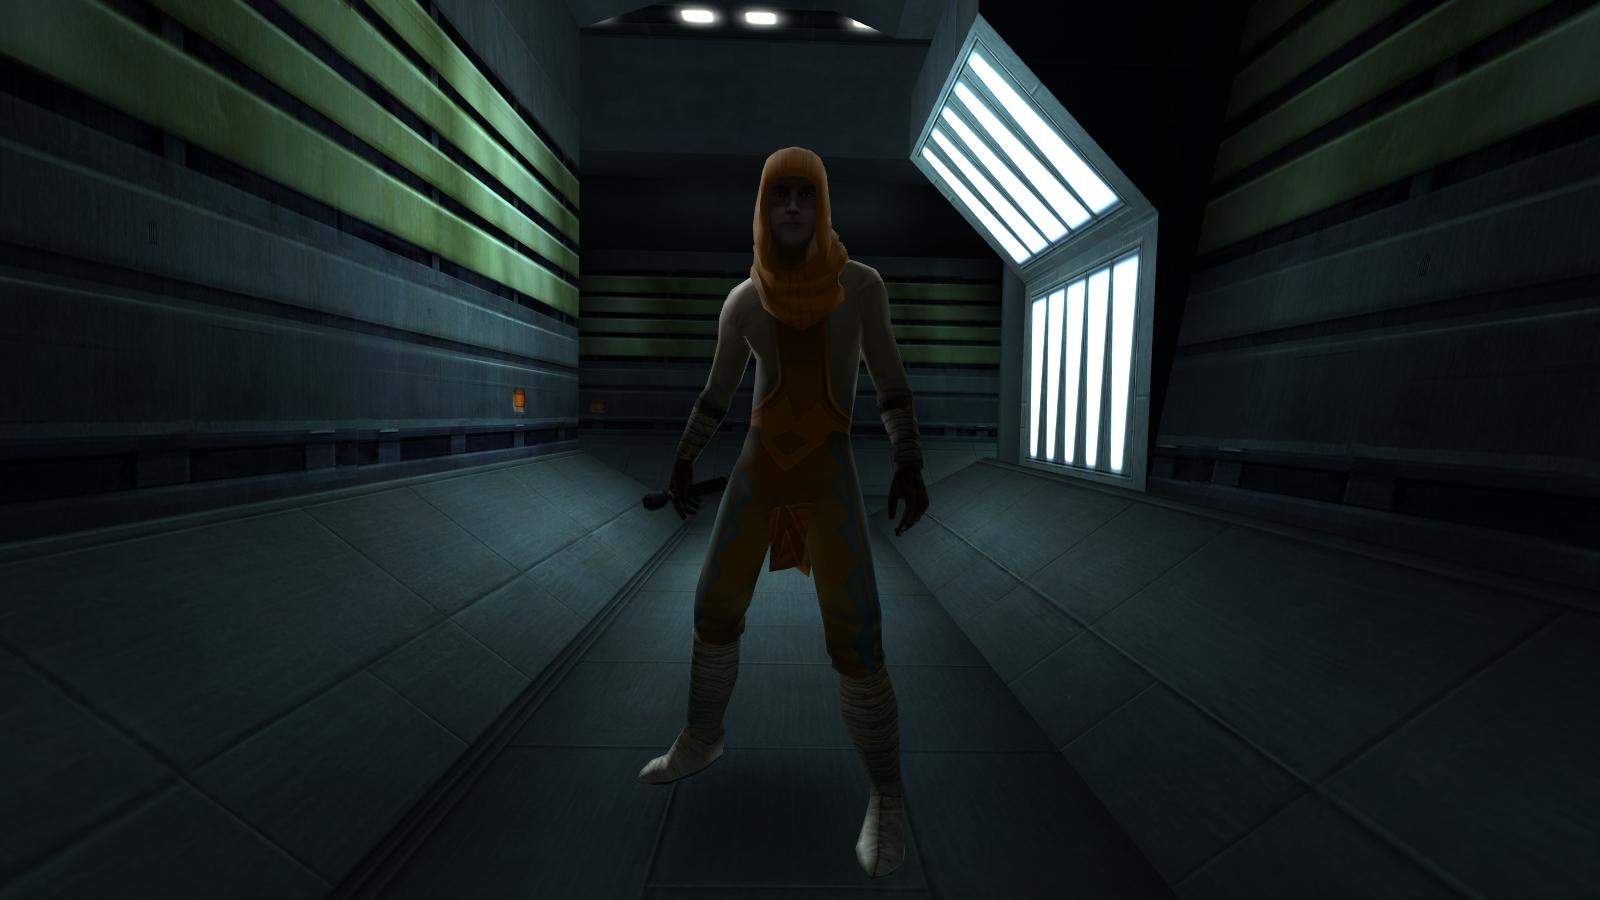 Image 2 - JK2 FX MOD for Star Wars Jedi Knight II: Jedi